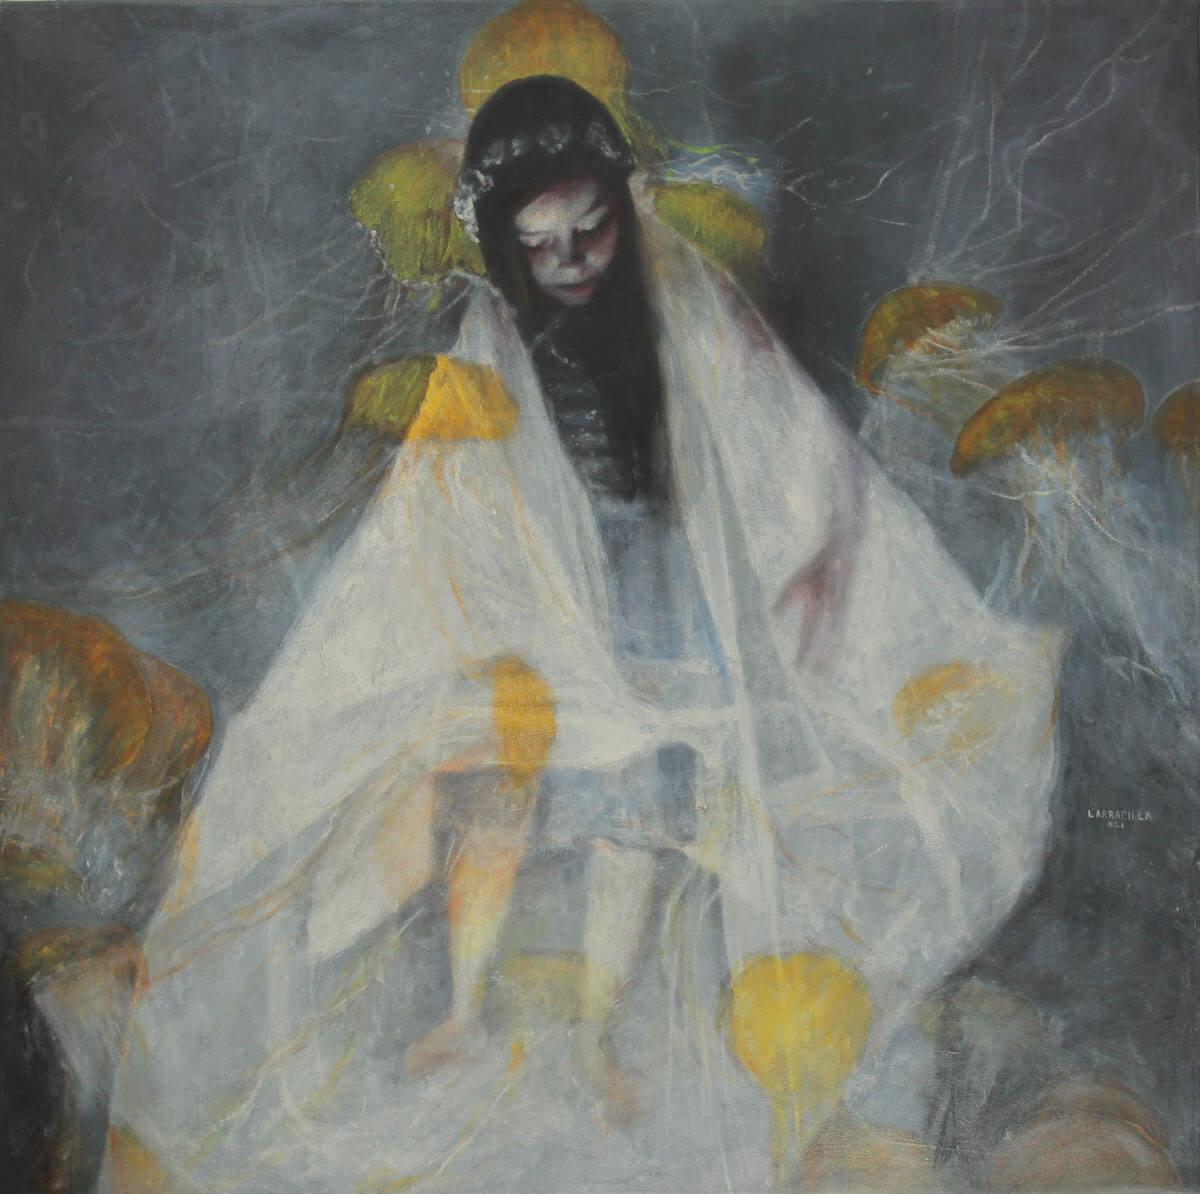 Carlos Larracilla, Apócrifa Art Magazine